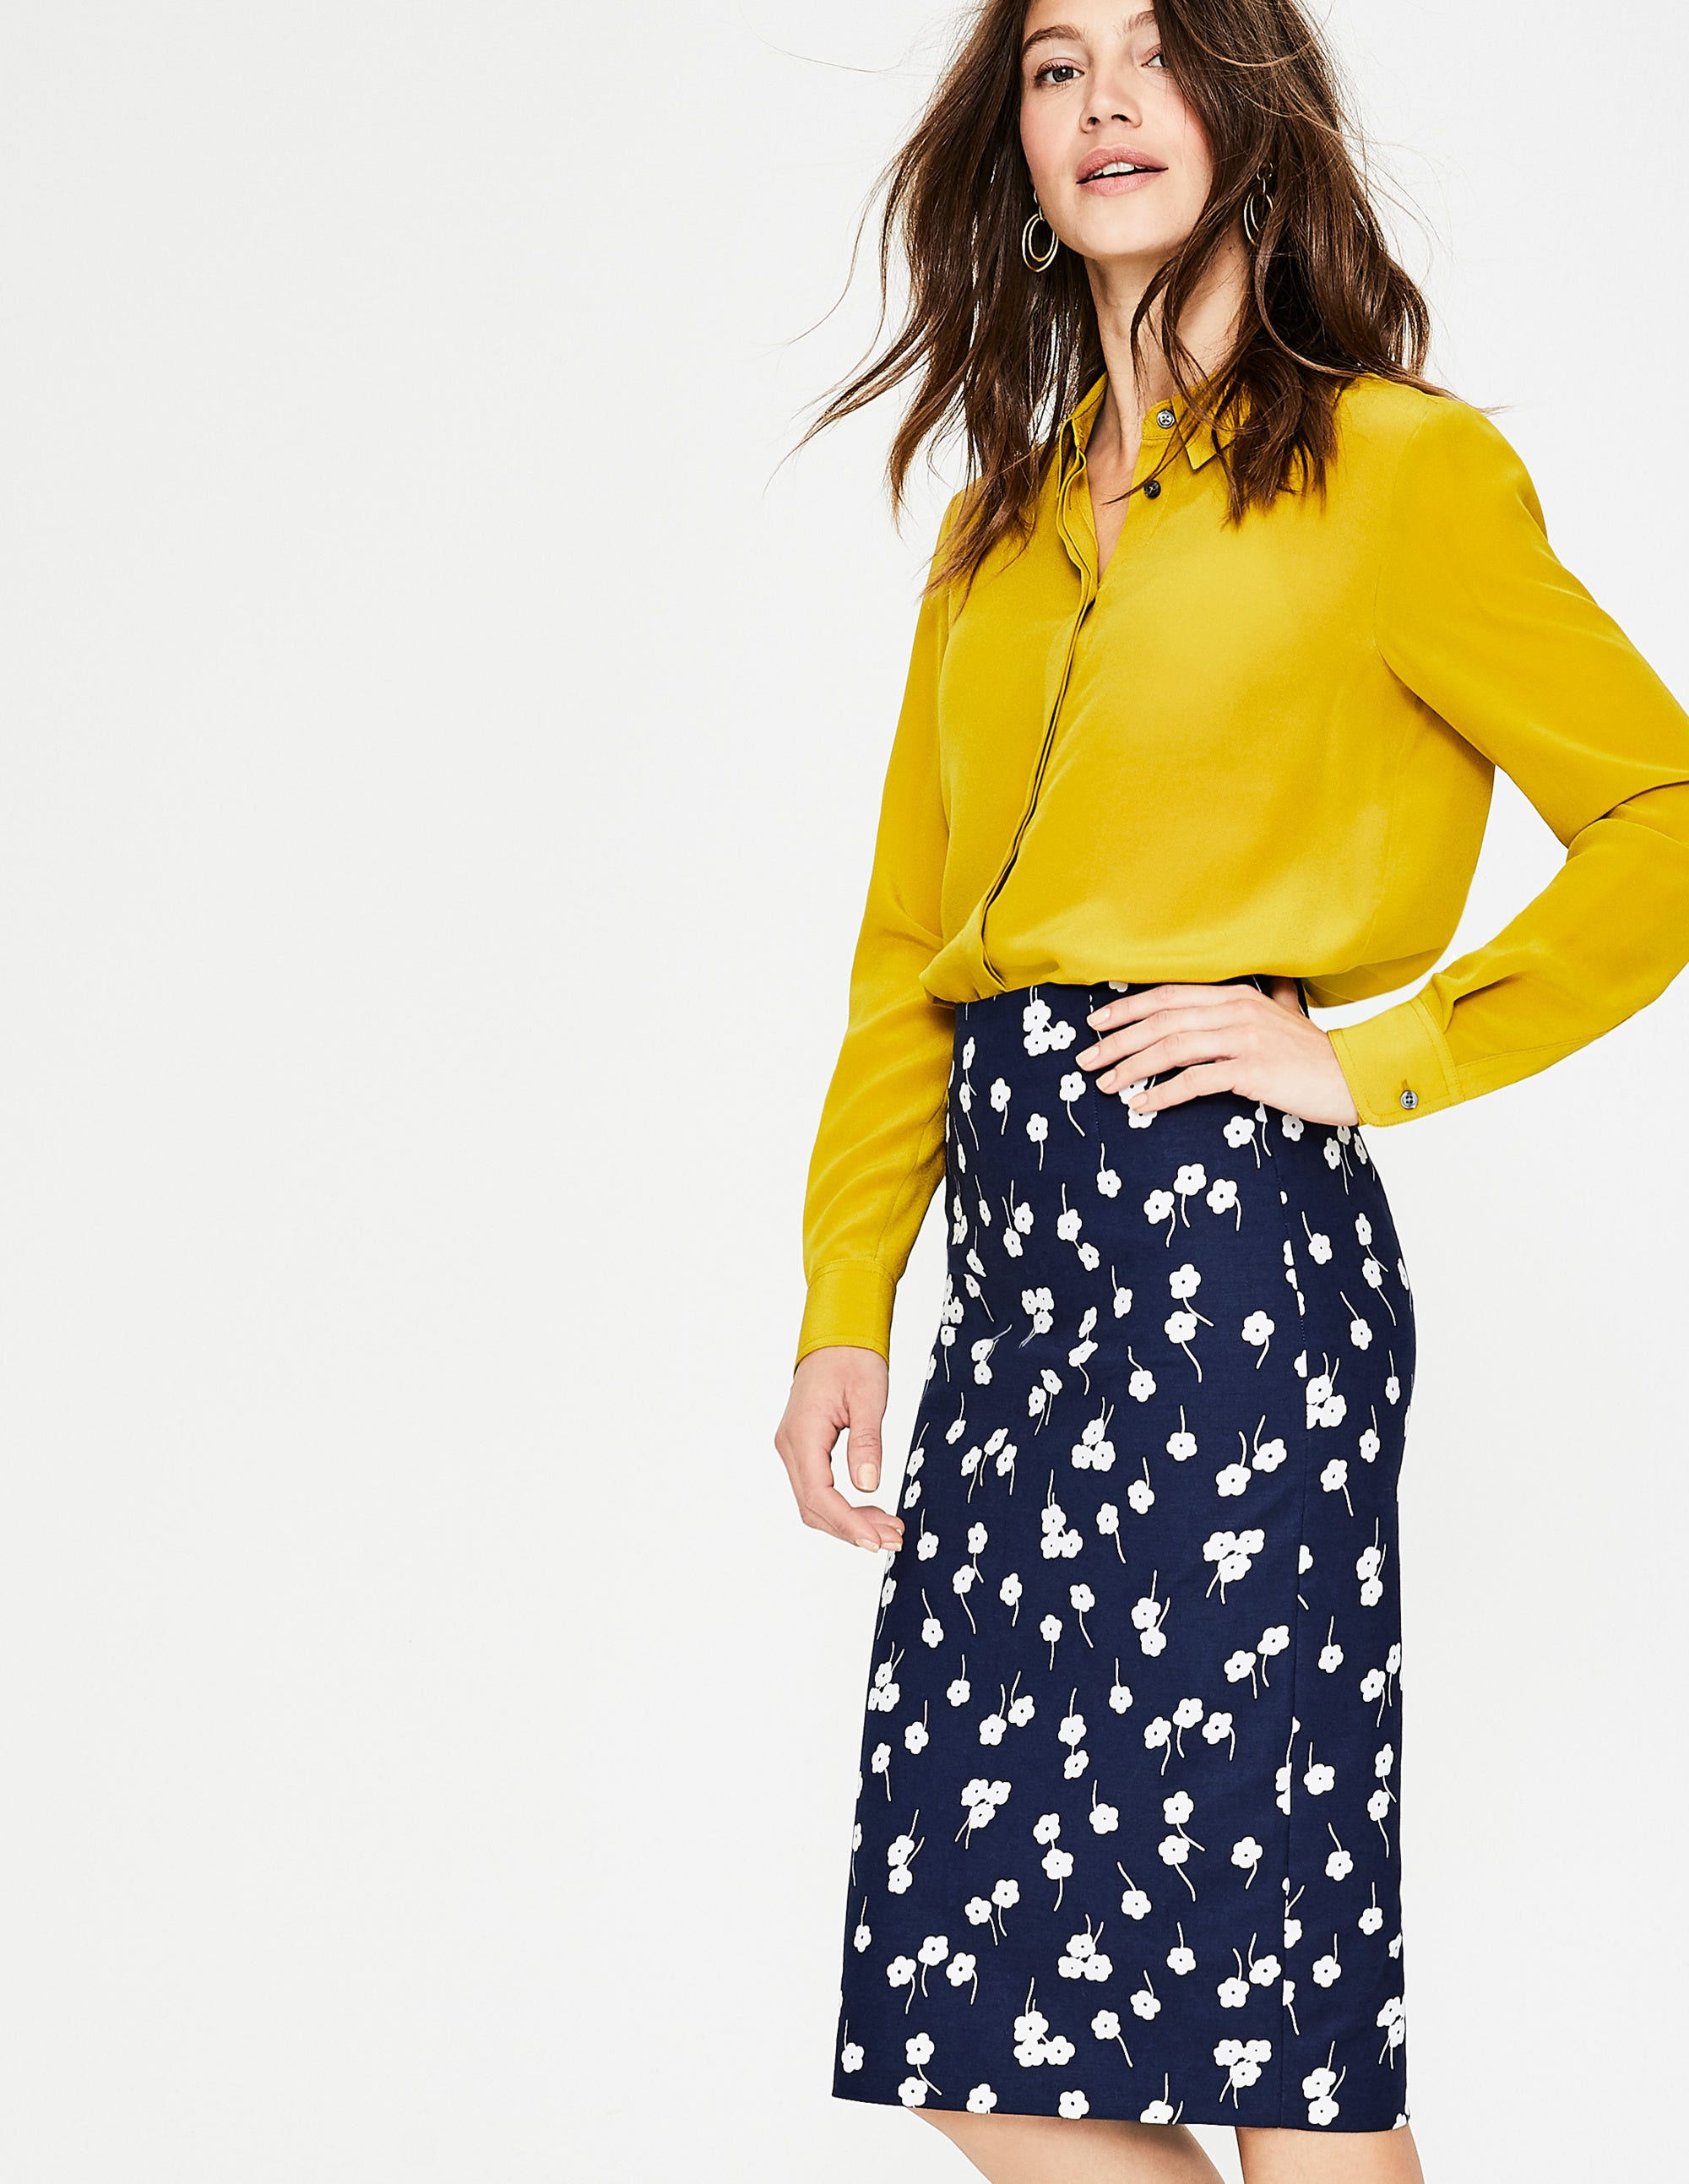 Boden Richmond Pencil Skirt - Navy, Blossom